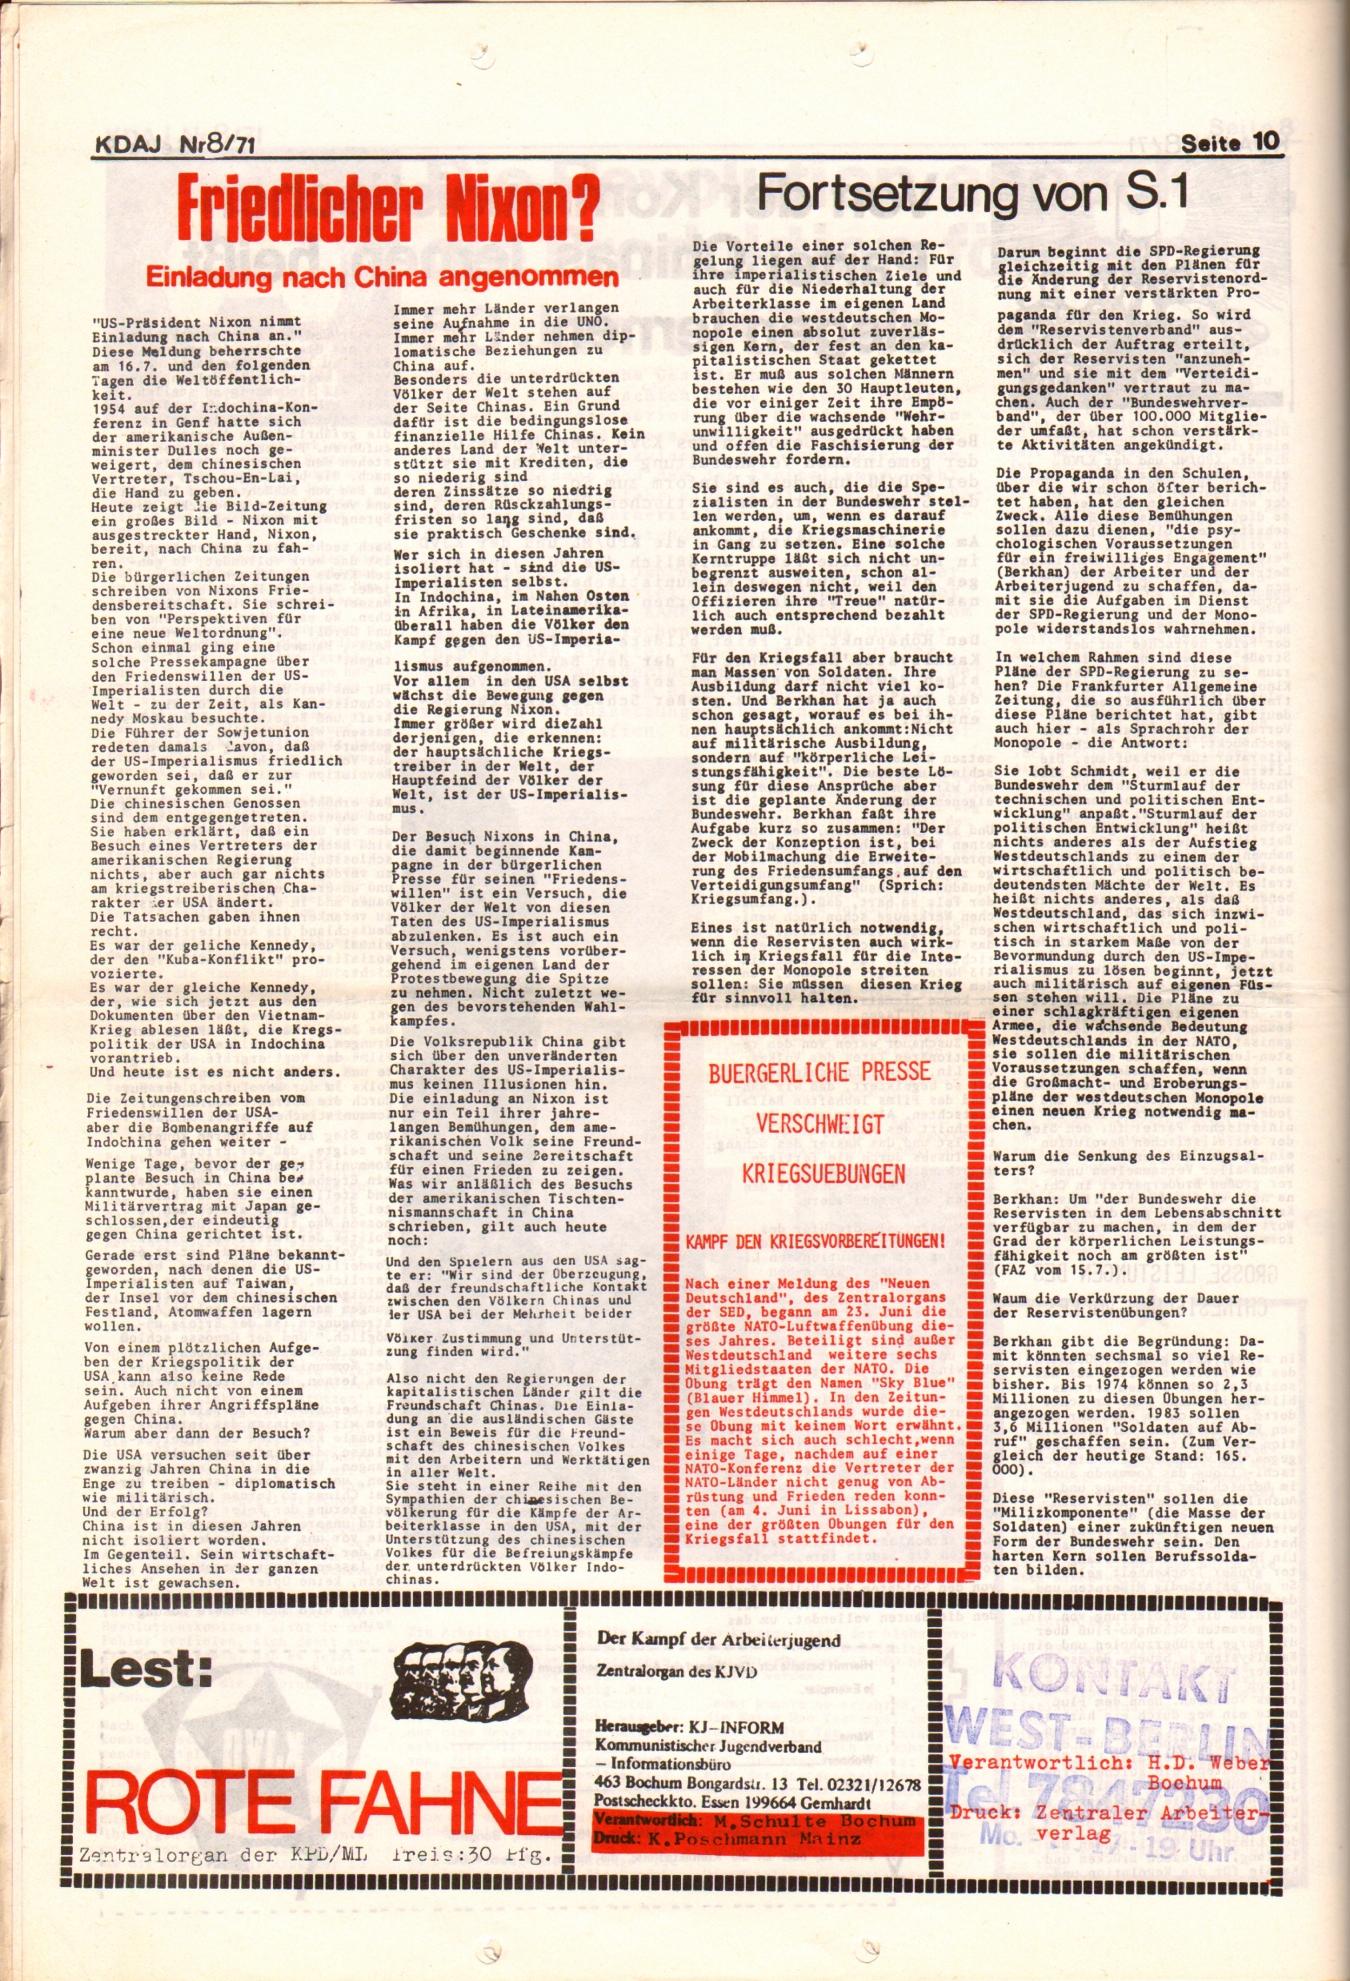 KDAJ, 2. Jg., August 1971, Nr. 8, Seite 10